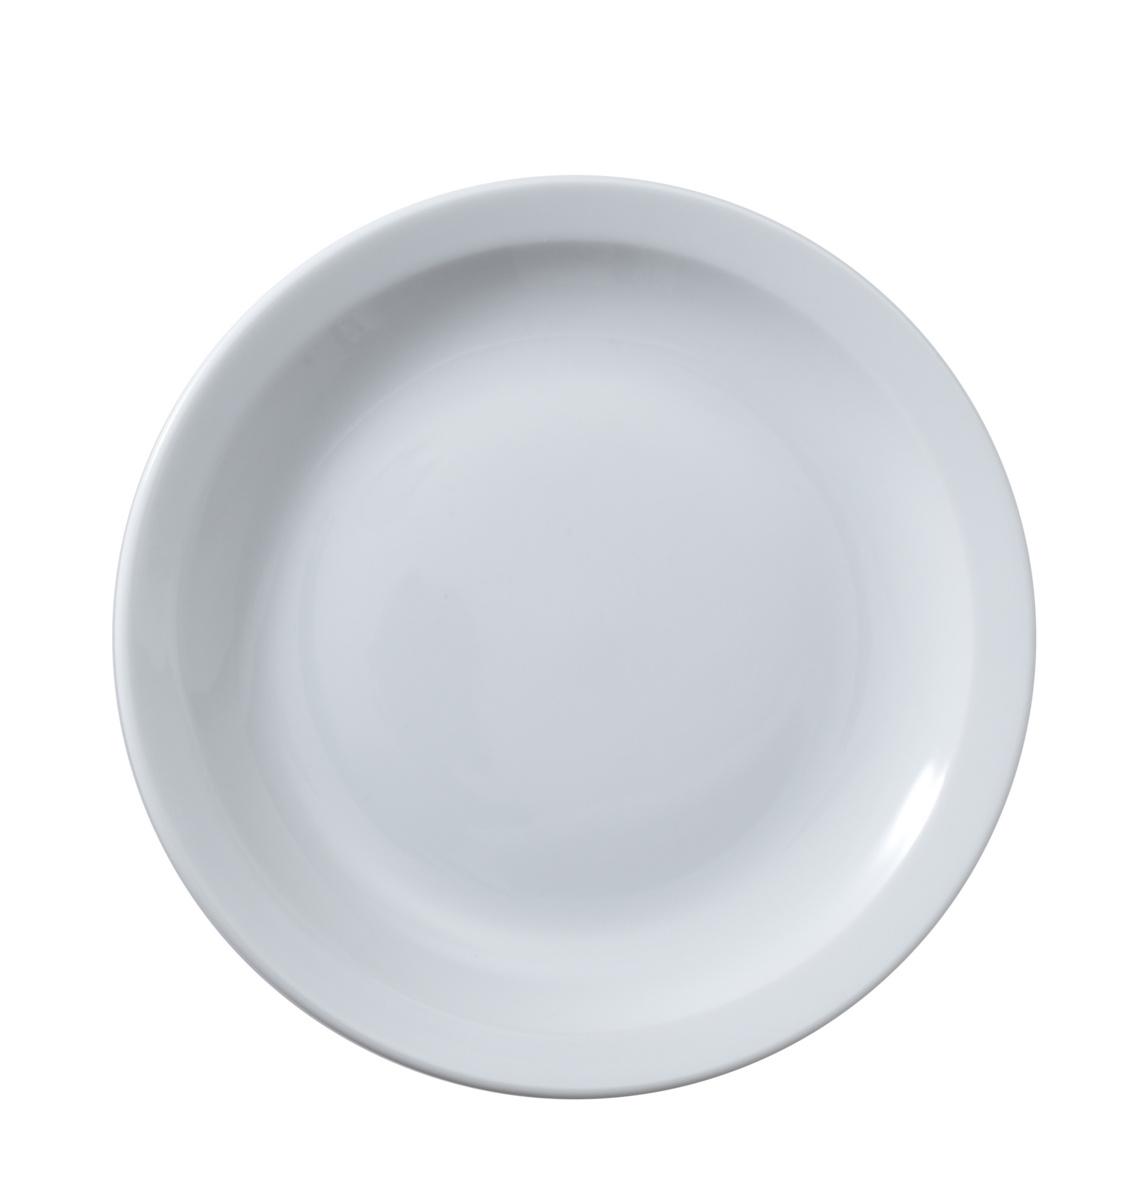 Assiette plate rond blanc Optima Vaisselle